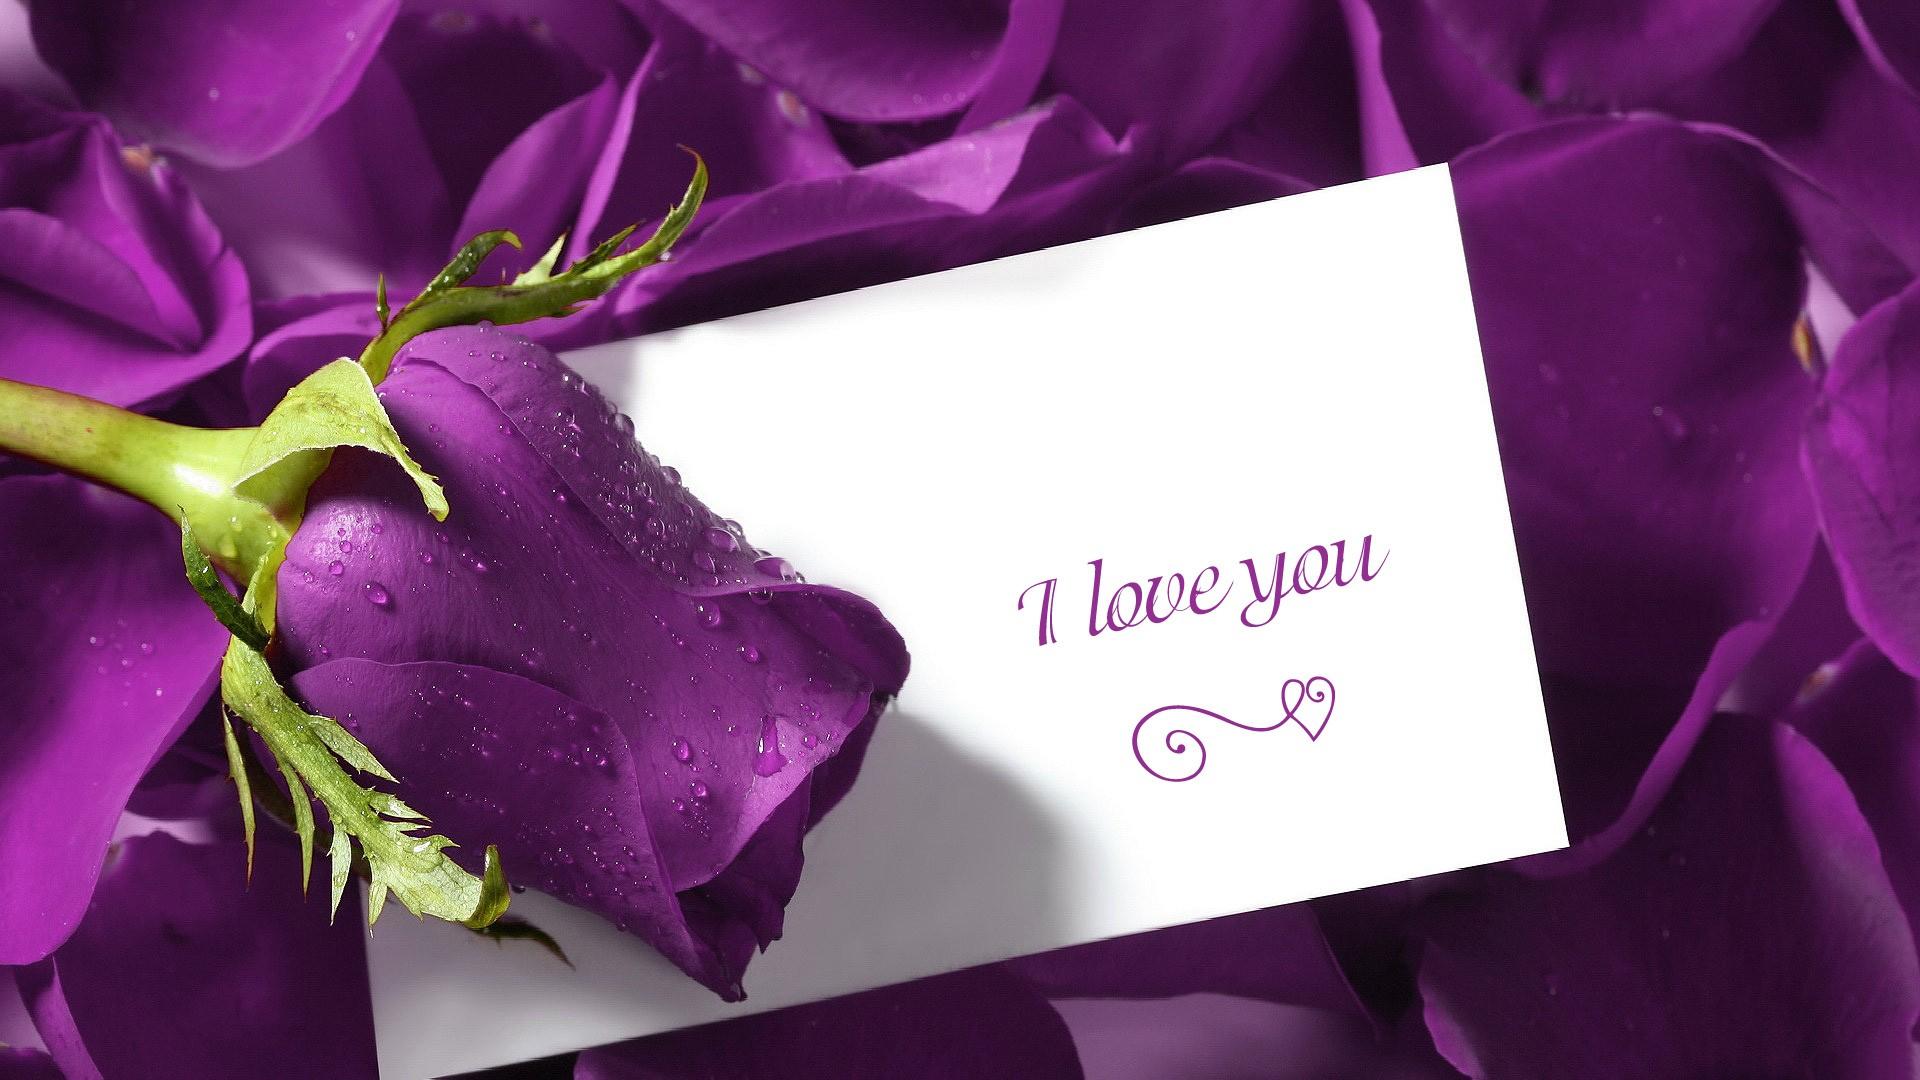 Wallpaper download new love - Wallpaper Download New Love 87